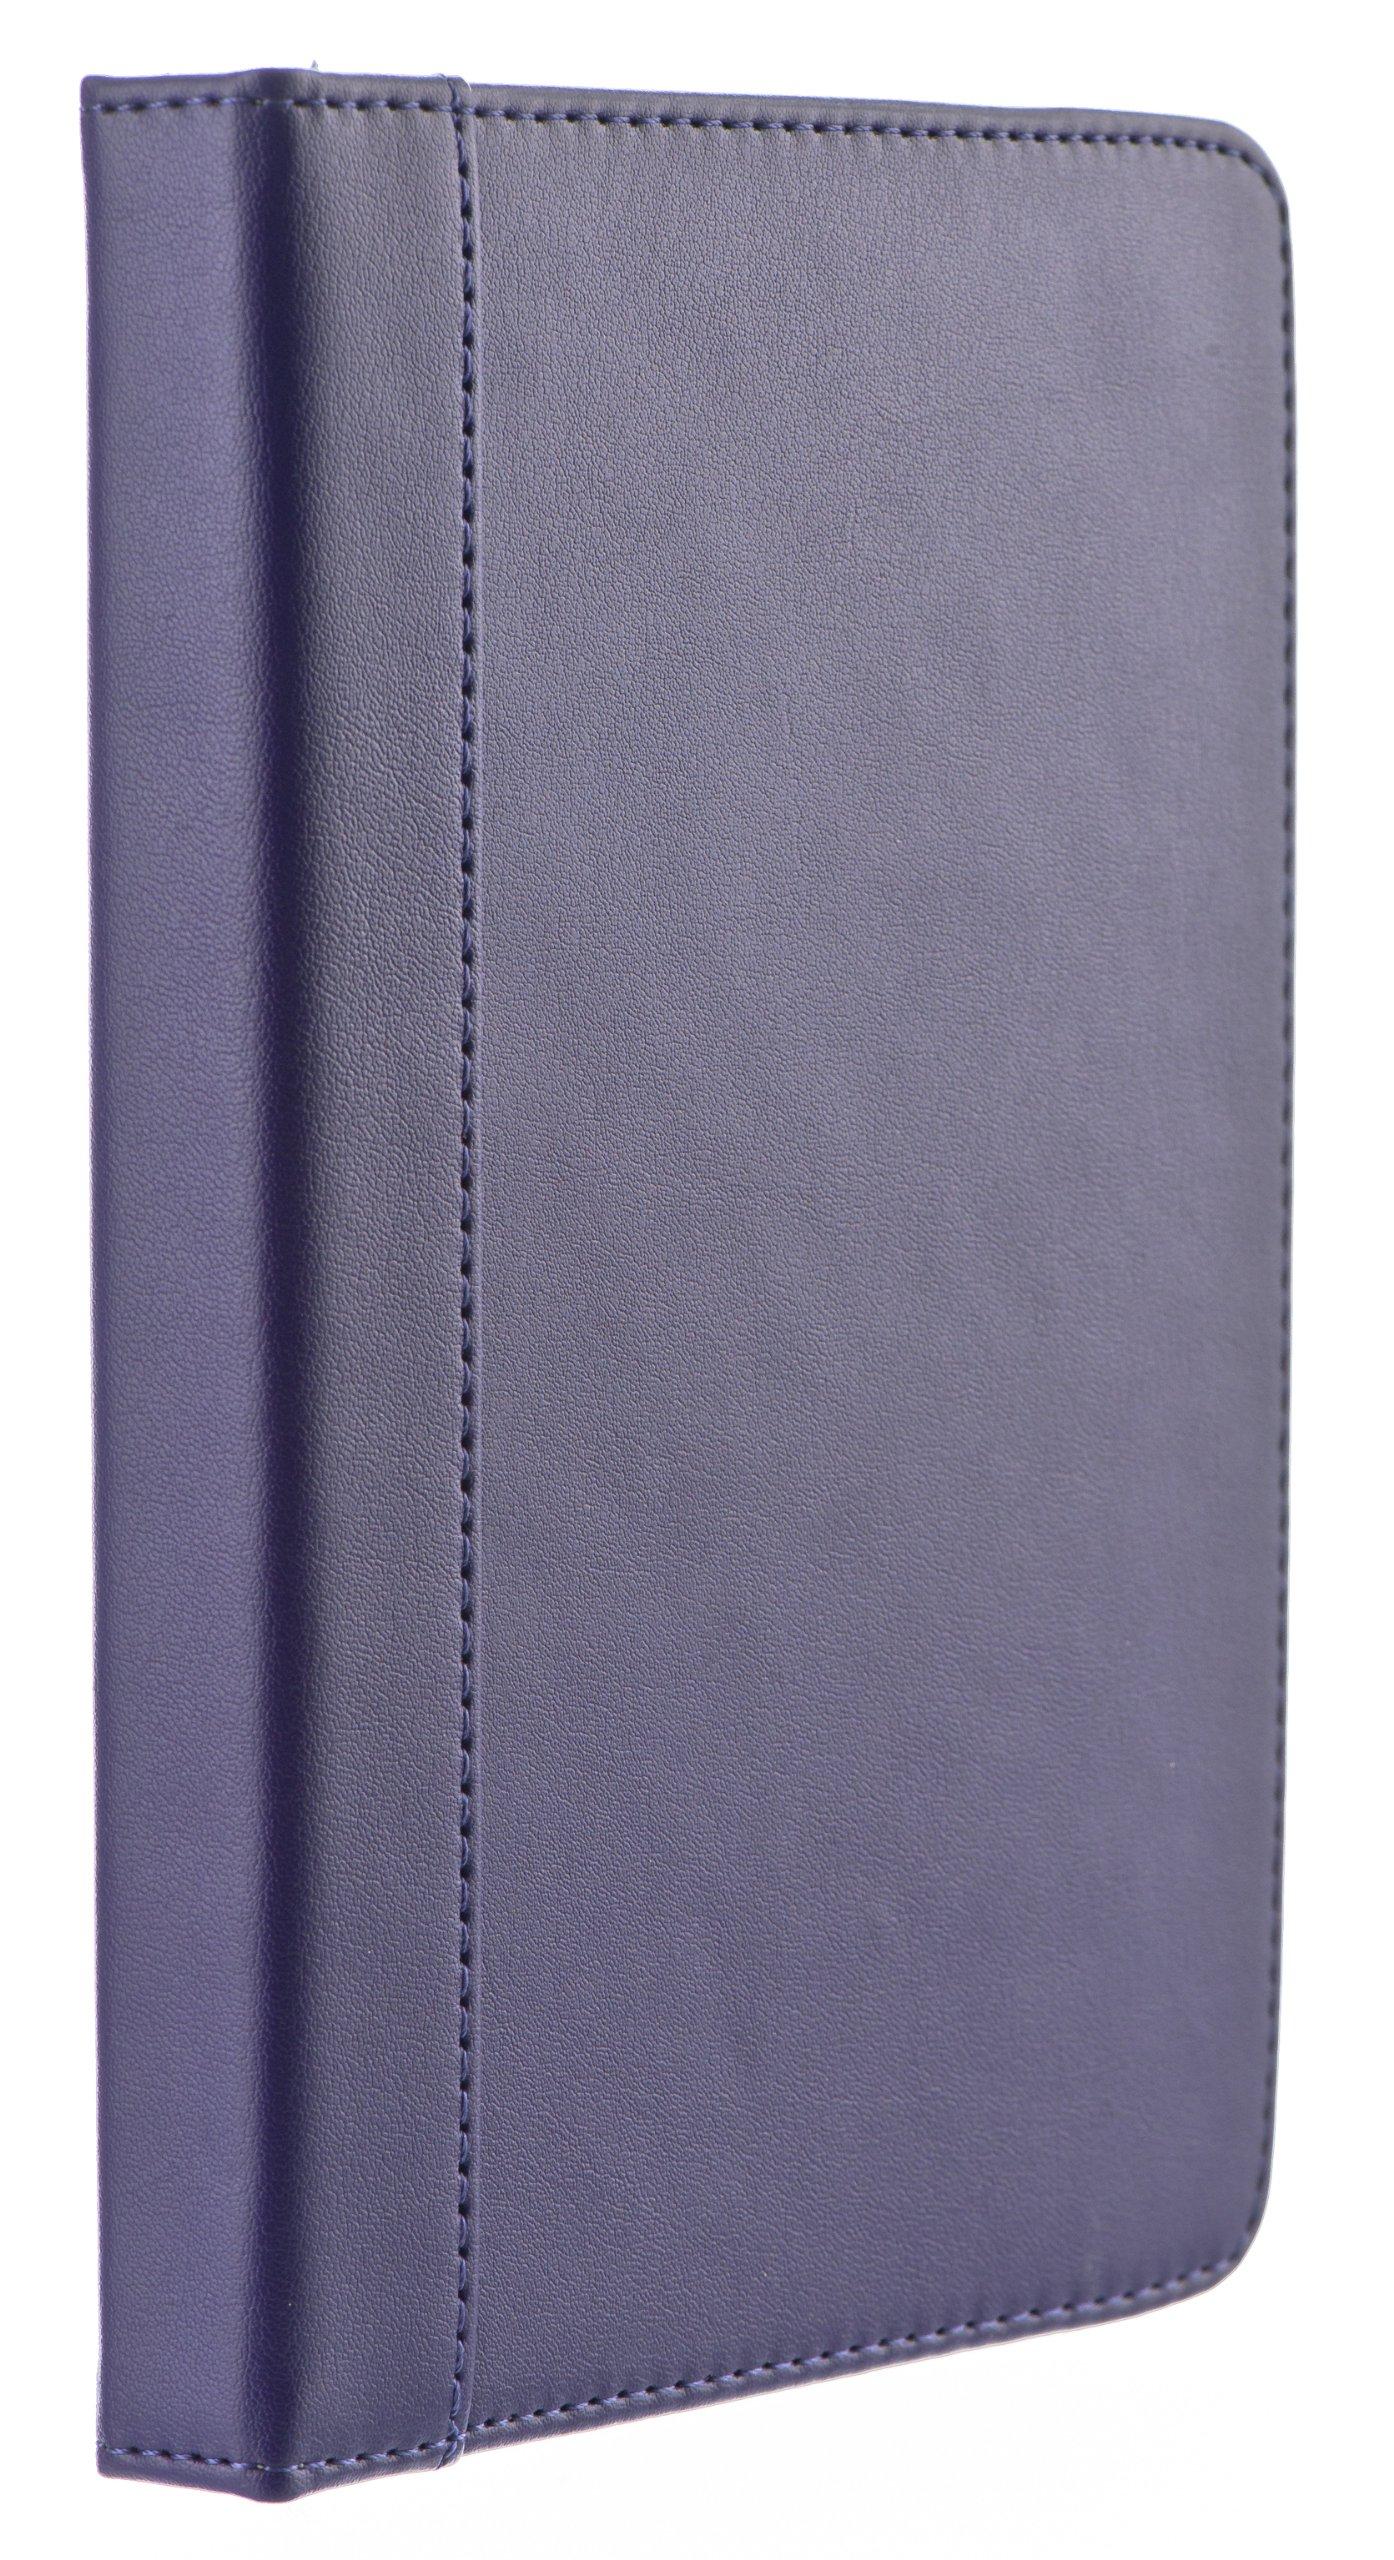 M-Edge Go Jacket for Kindle 4/Touch, Purple